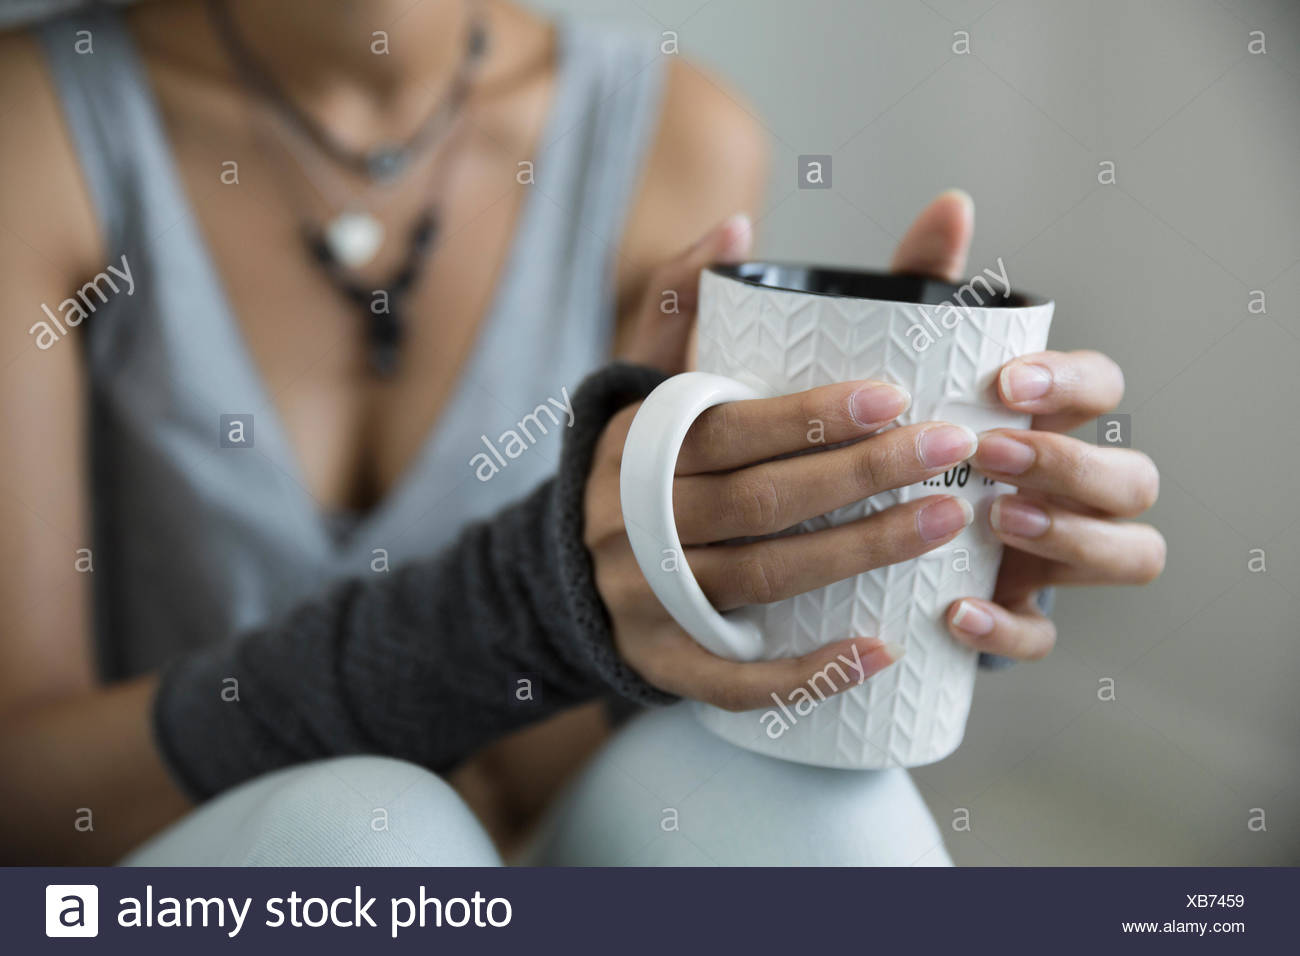 Junge Frau trinkt Kaffee Pulswärmer hautnah Stockbild